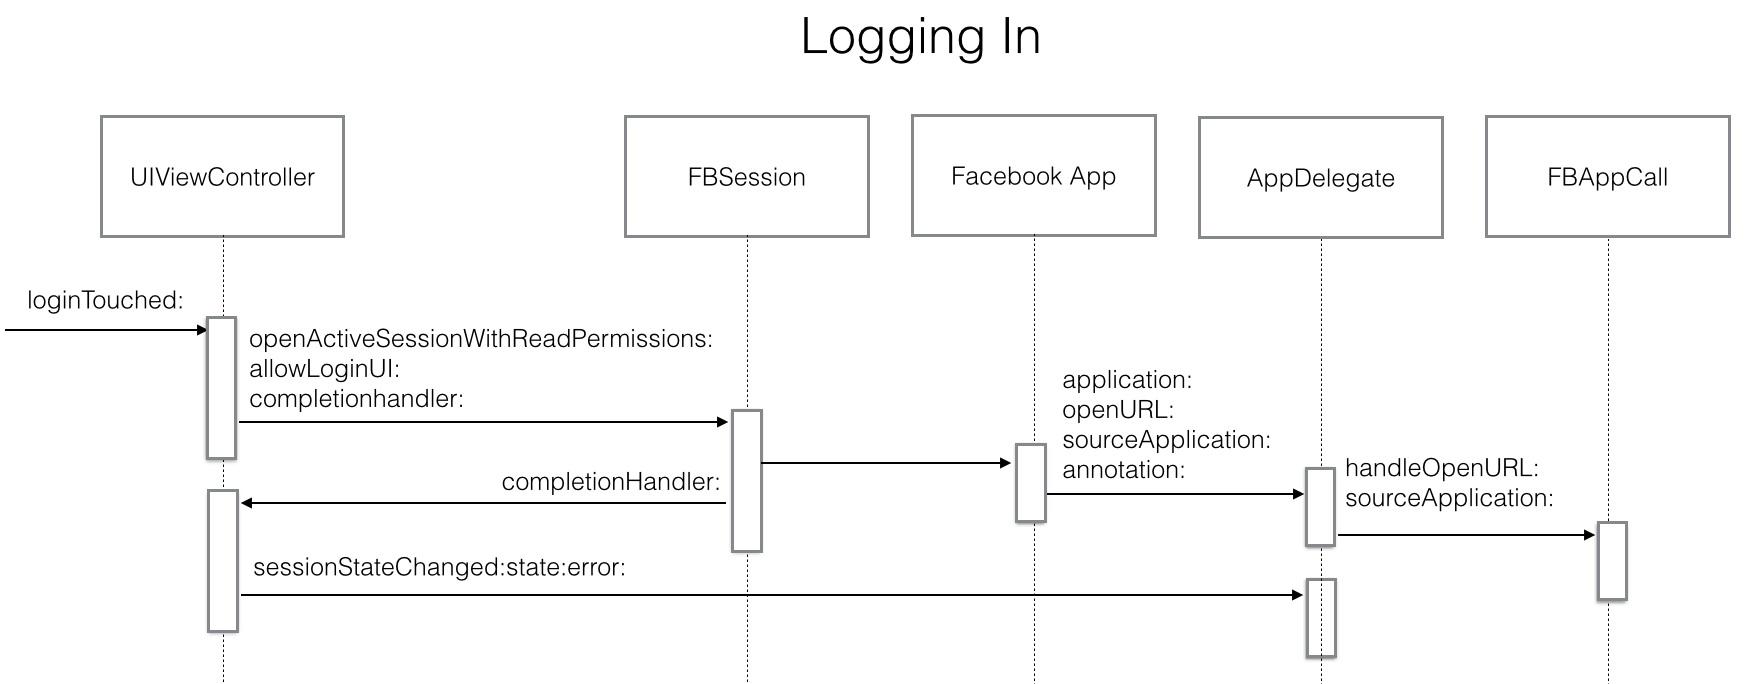 Logging In sequence diagram